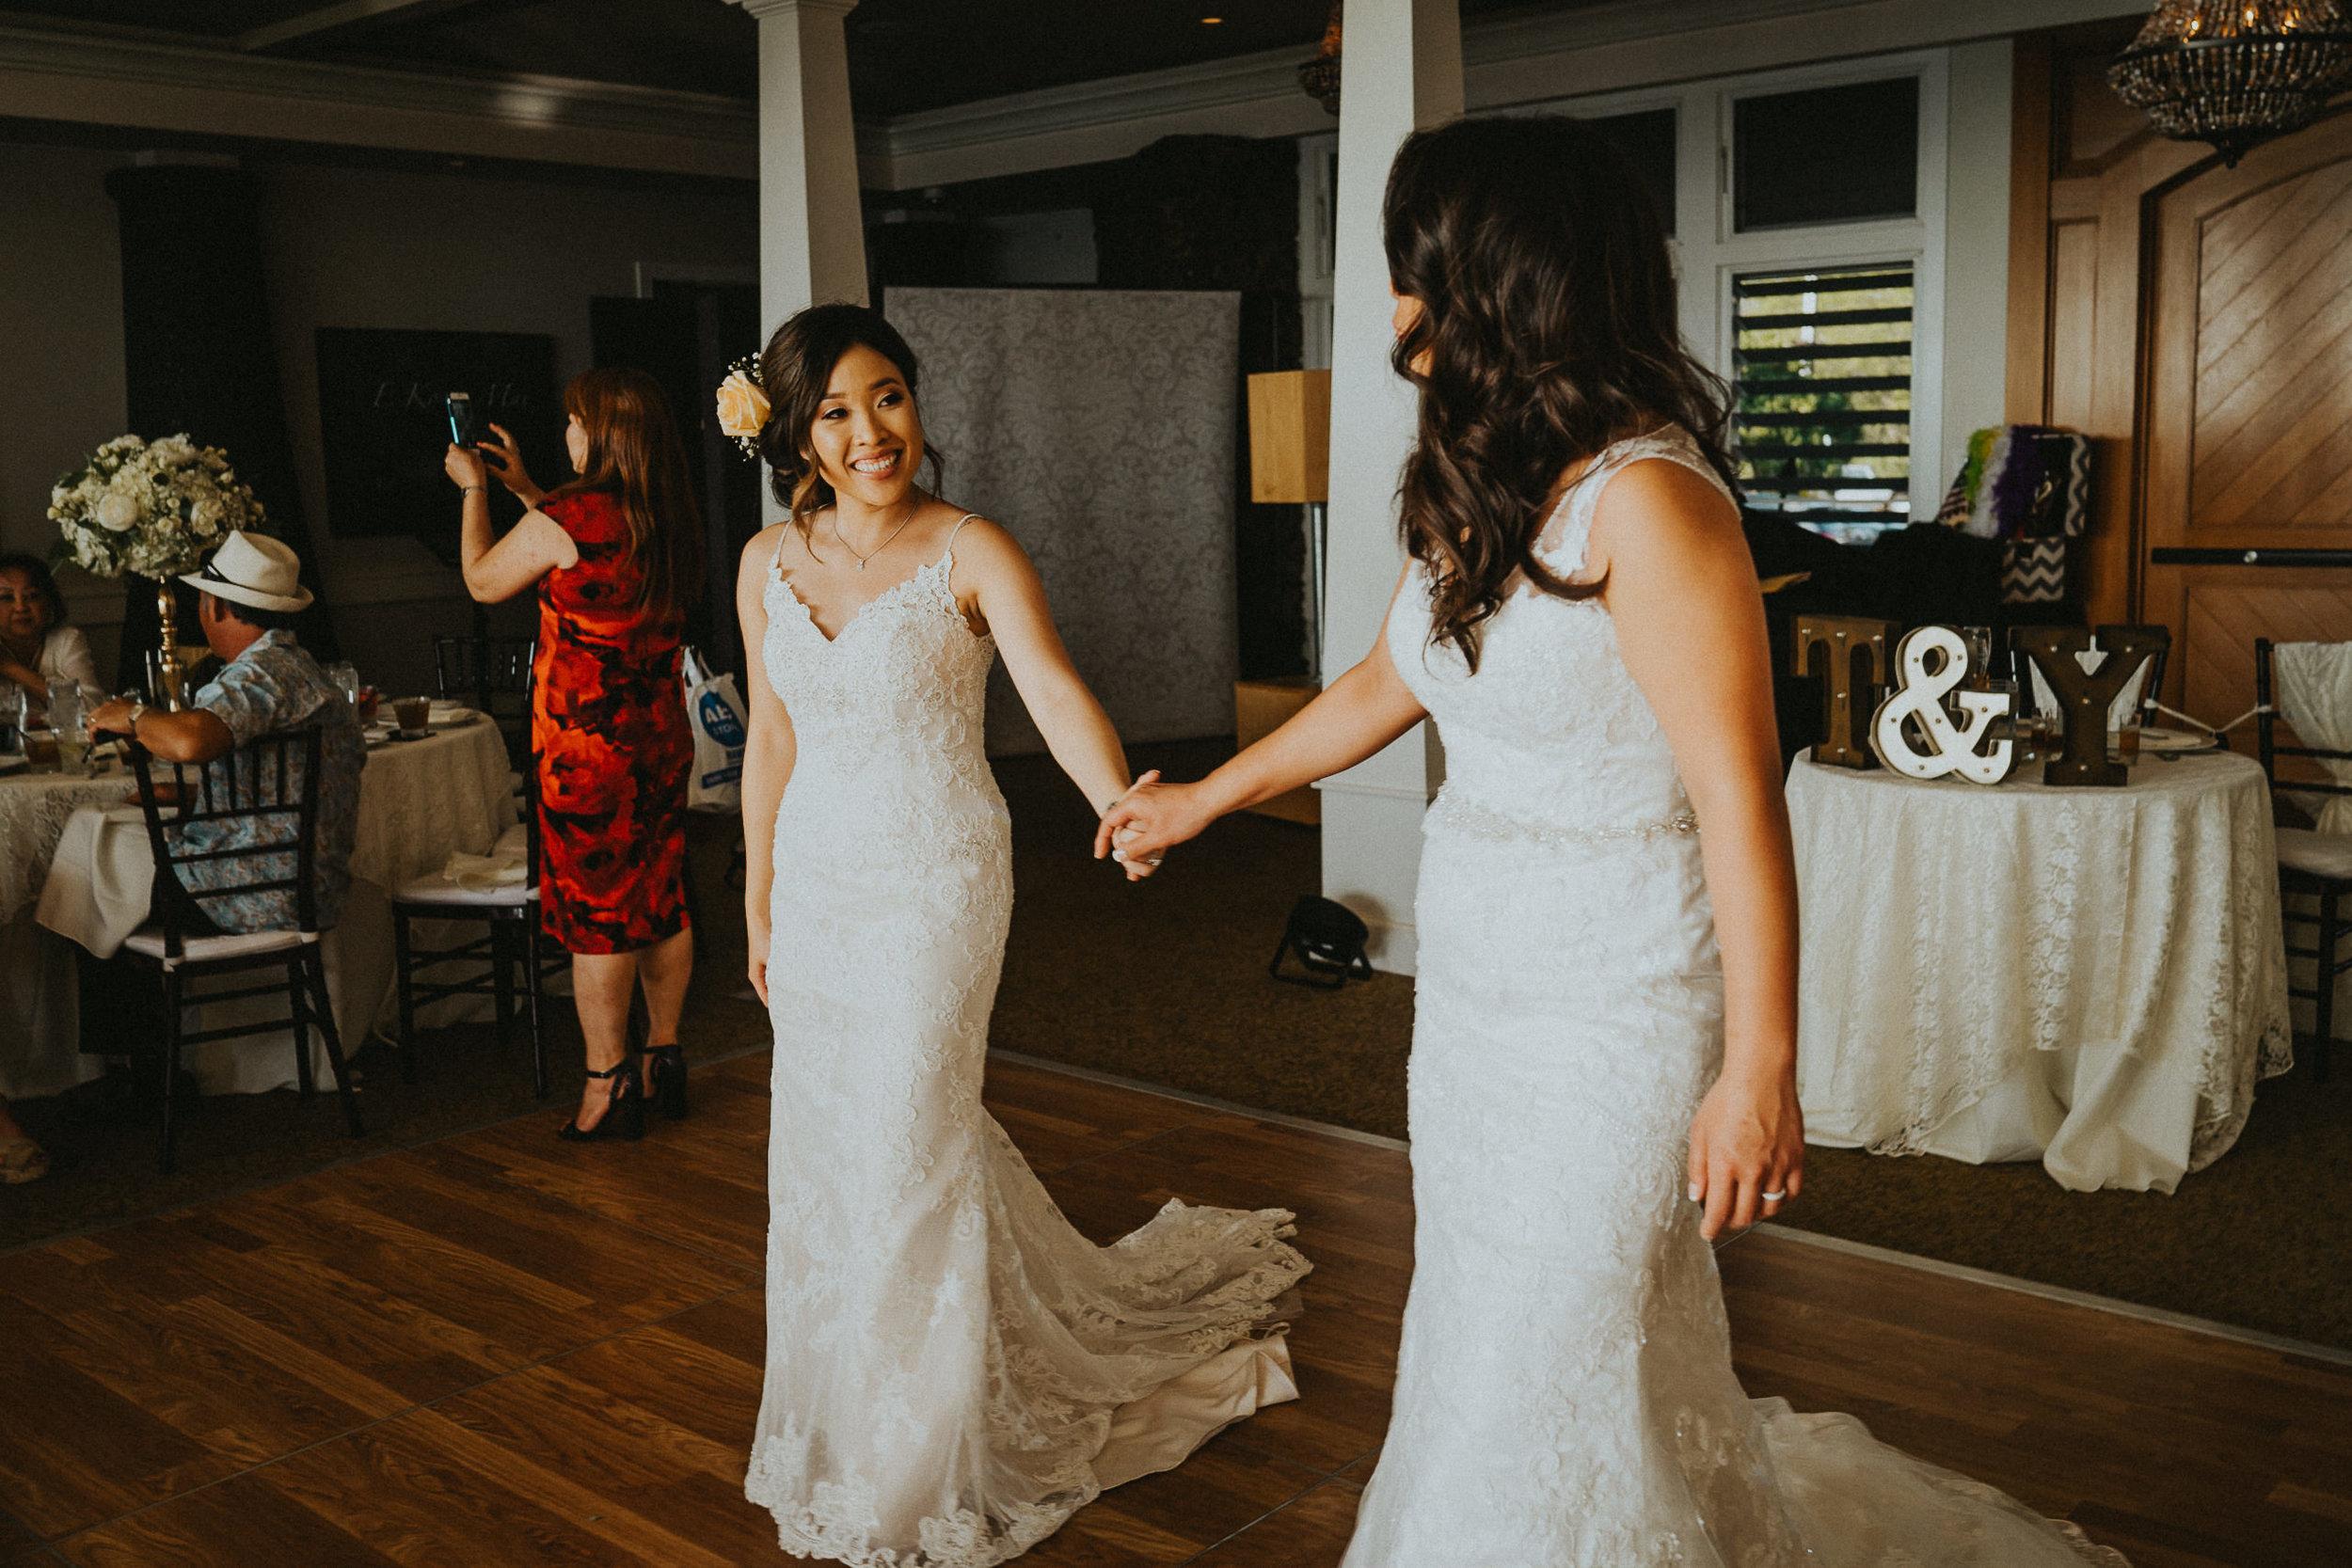 Maui_Destination_wedding_Alfred_Tang-38.jpg